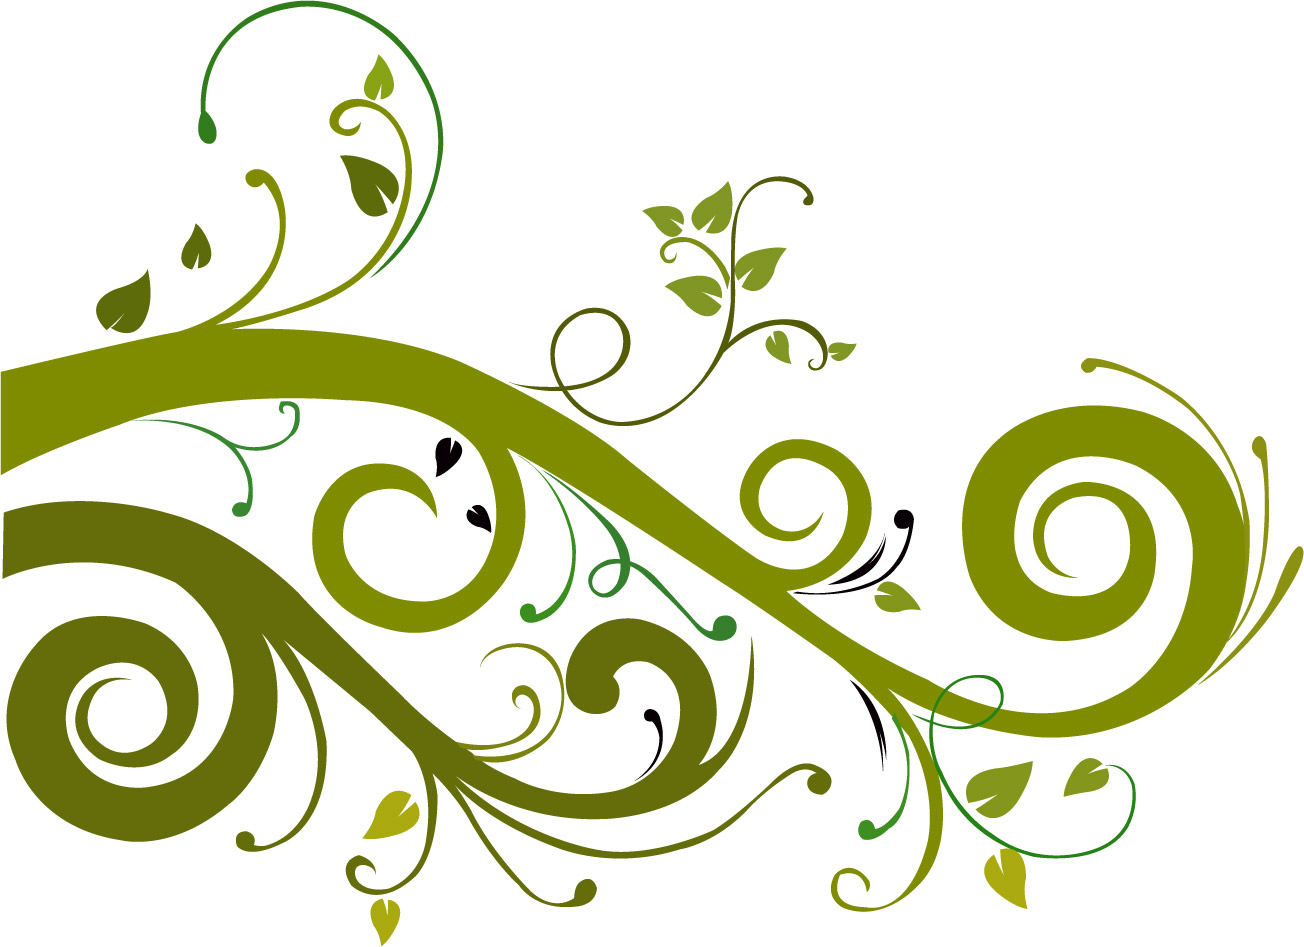 Flower Vector Graphic 7554 Hd Wallpapers in Vector n Designs 1304x947